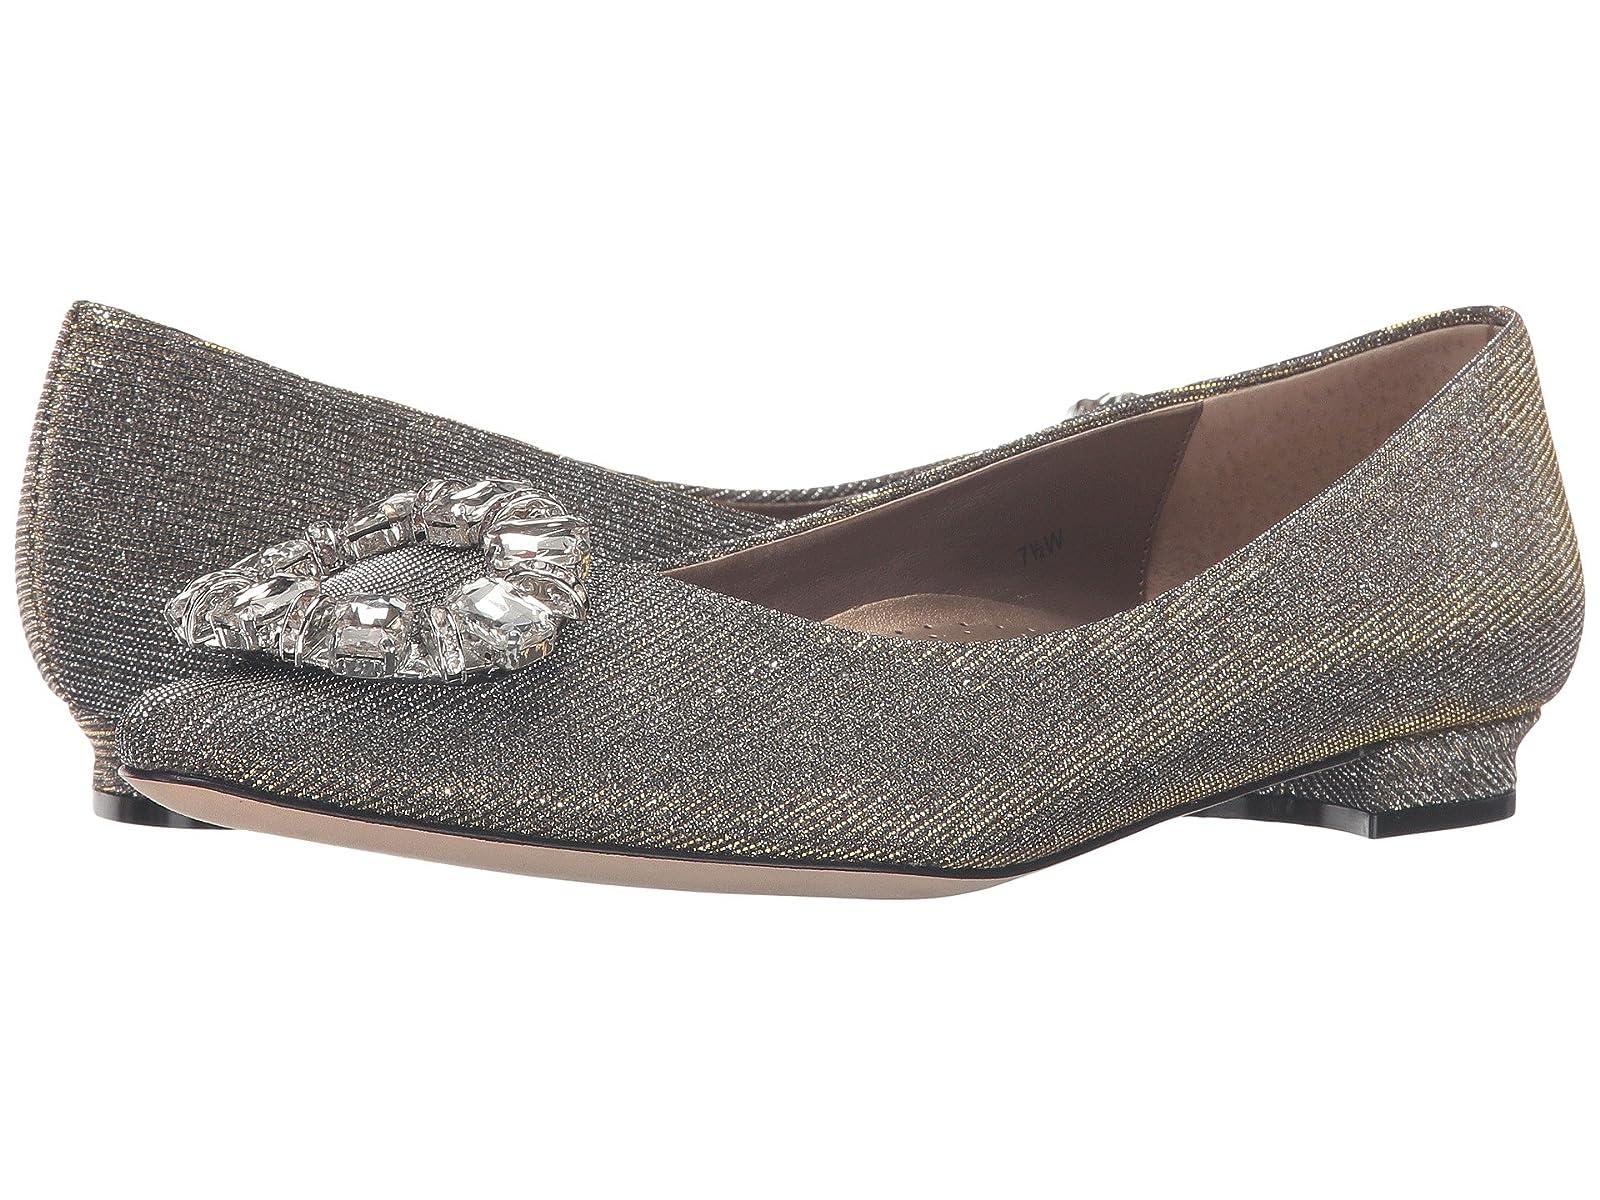 Vaneli StevieCheap and distinctive eye-catching shoes